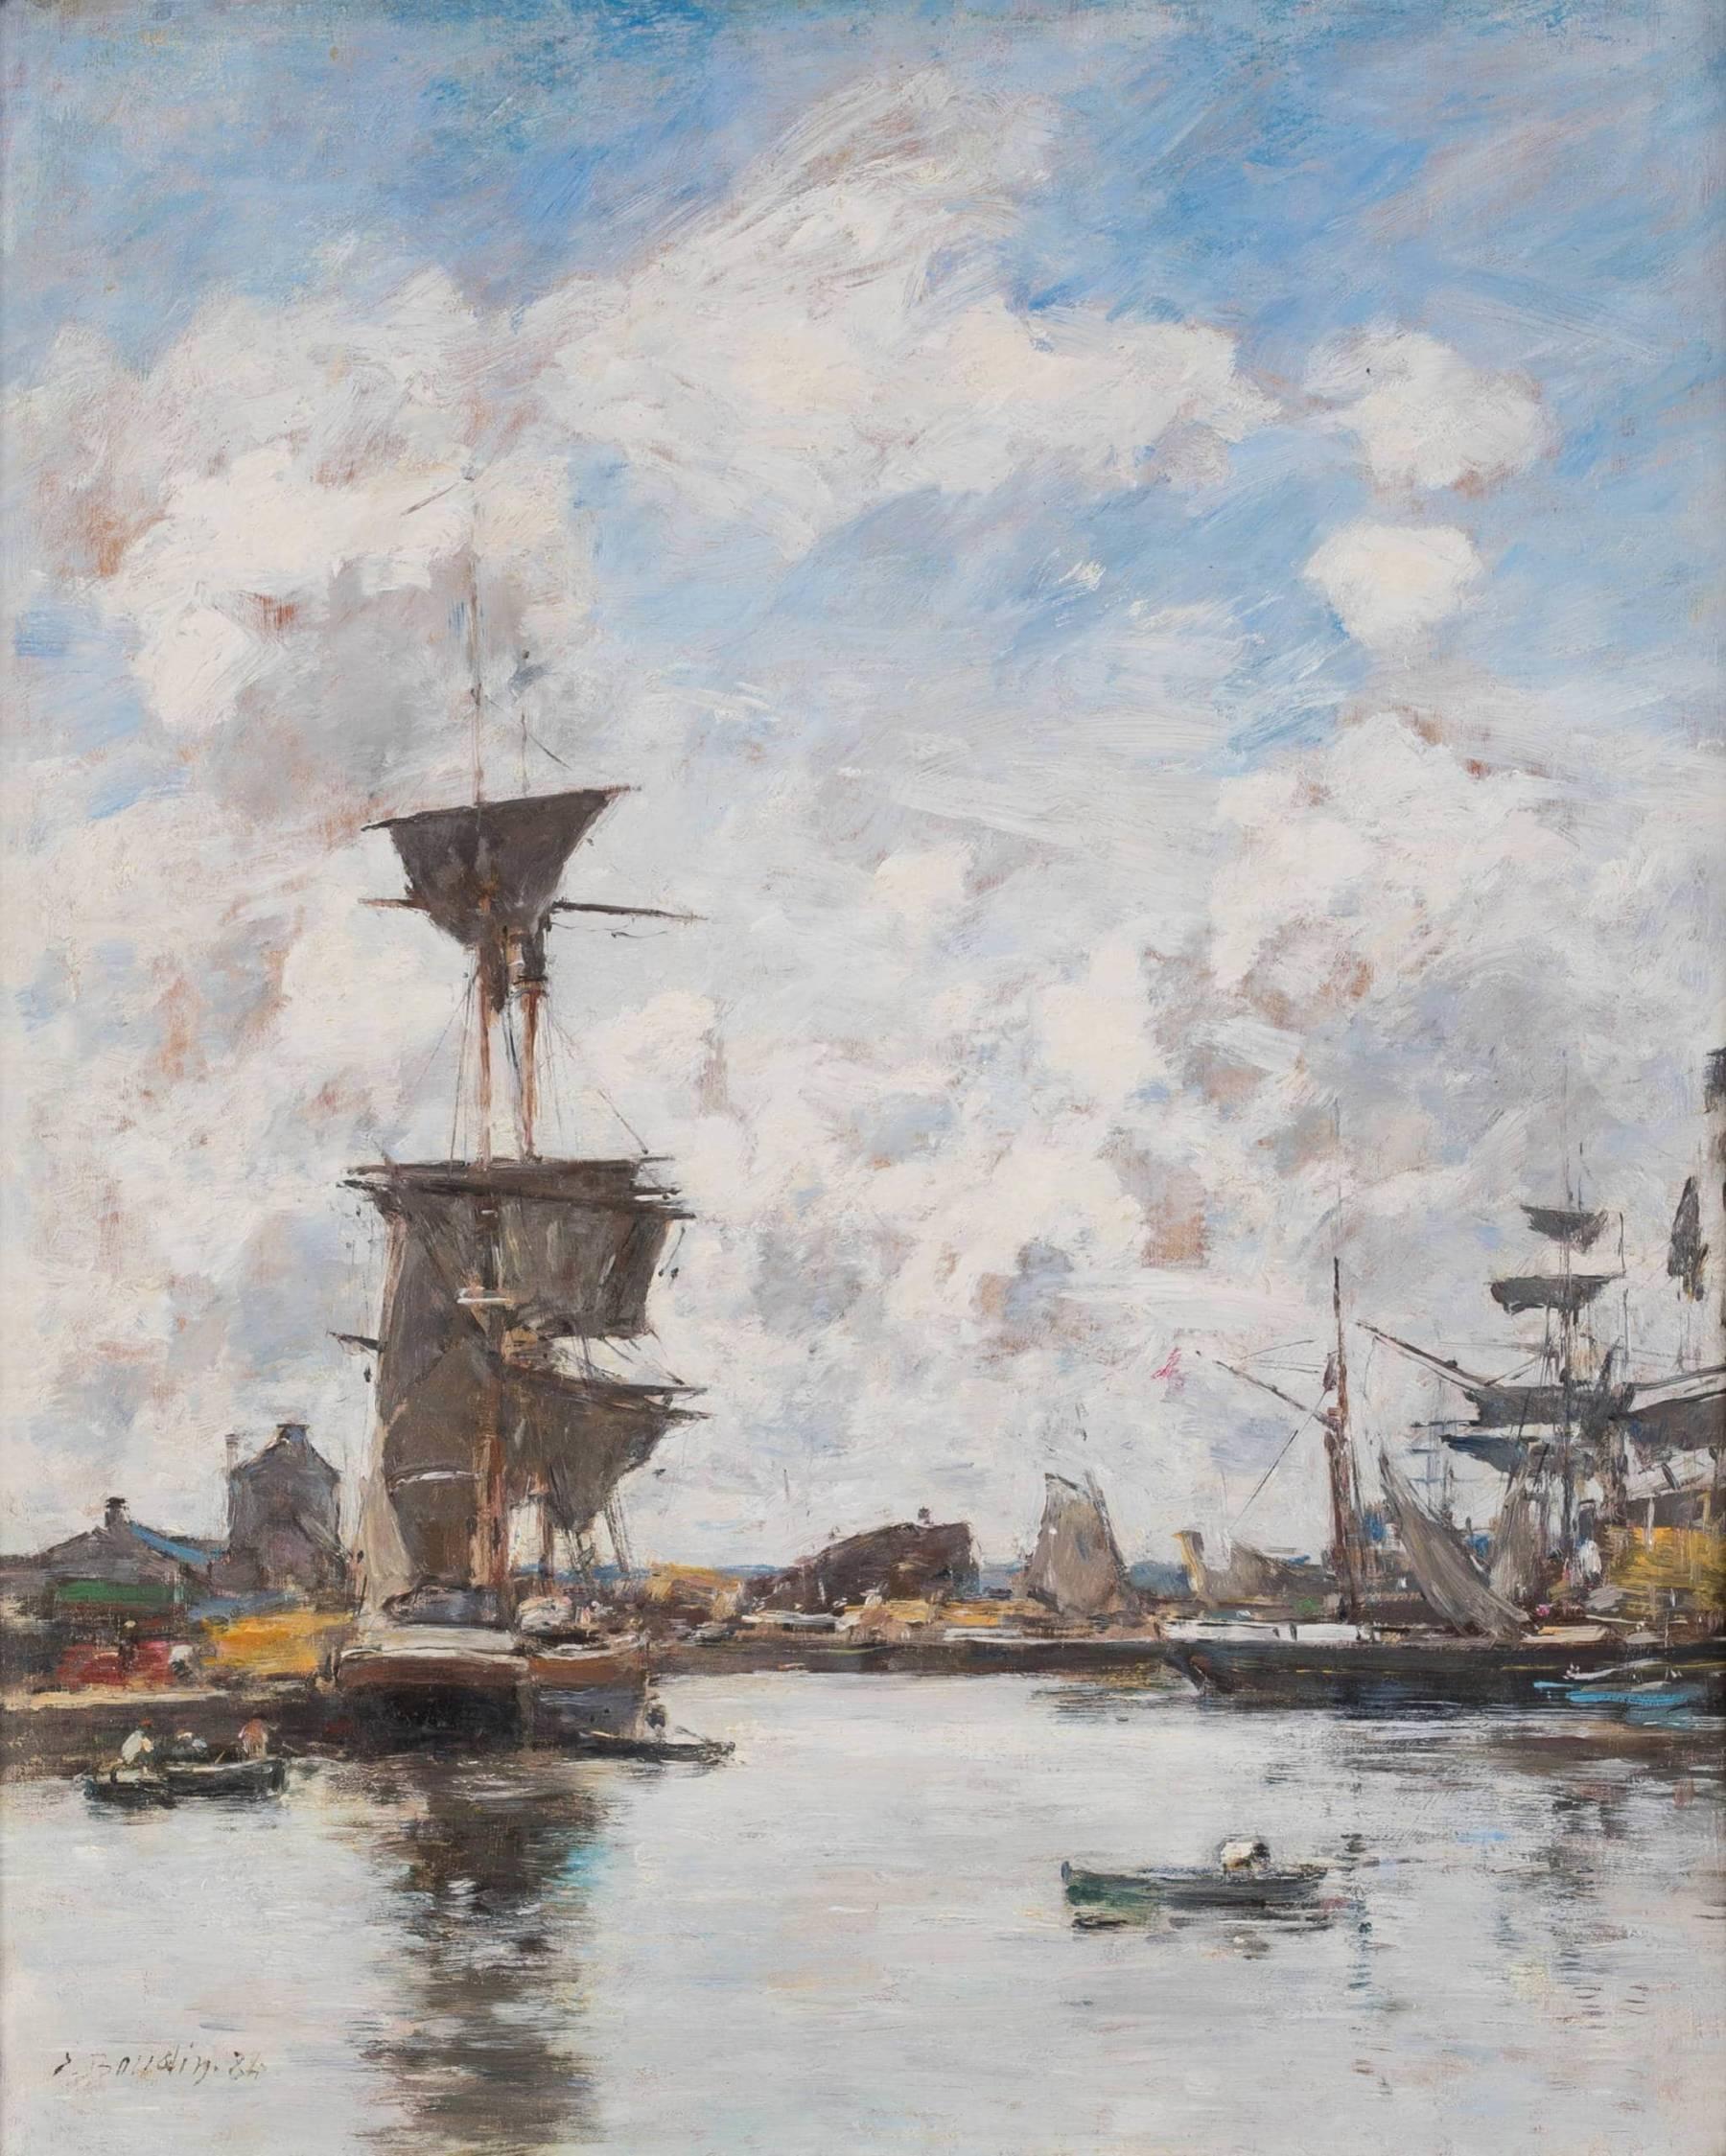 Eugène Boudin, Deauville, le bassin